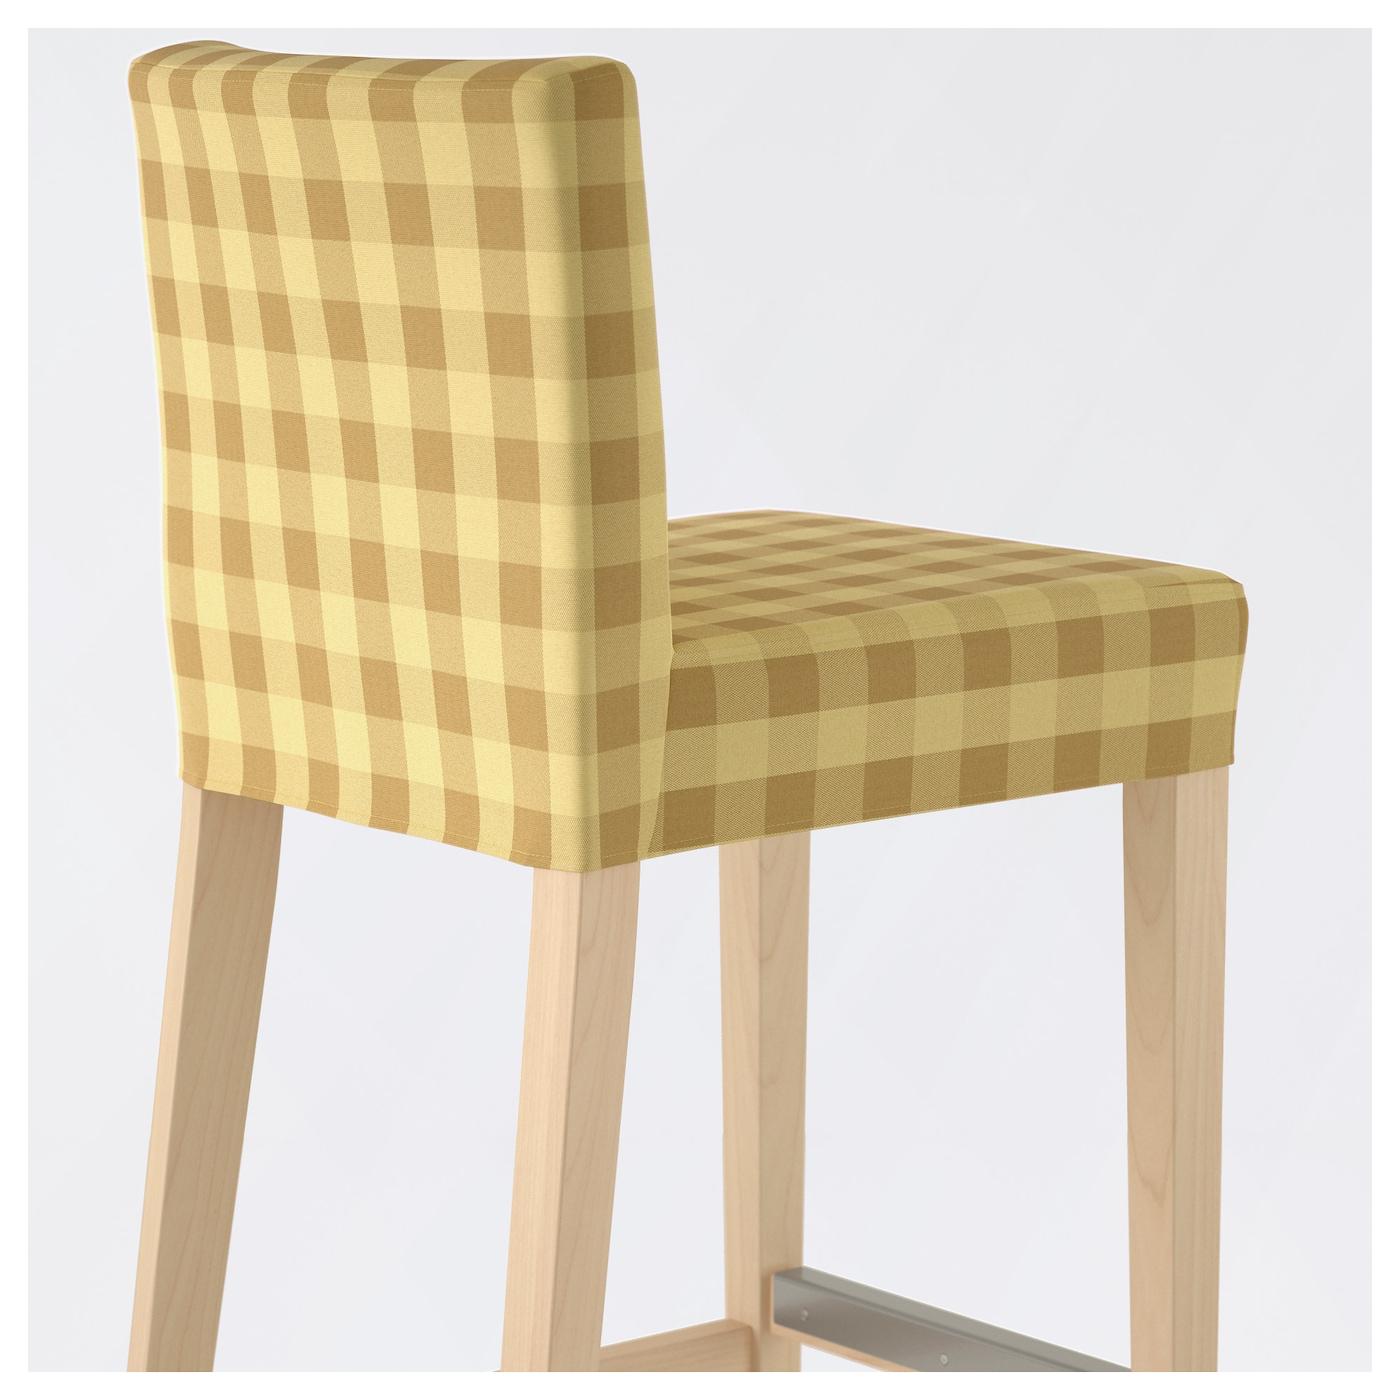 HENRIKSDAL Bar stool with backrest Birch skaftarp yellow 63 cm IKEA